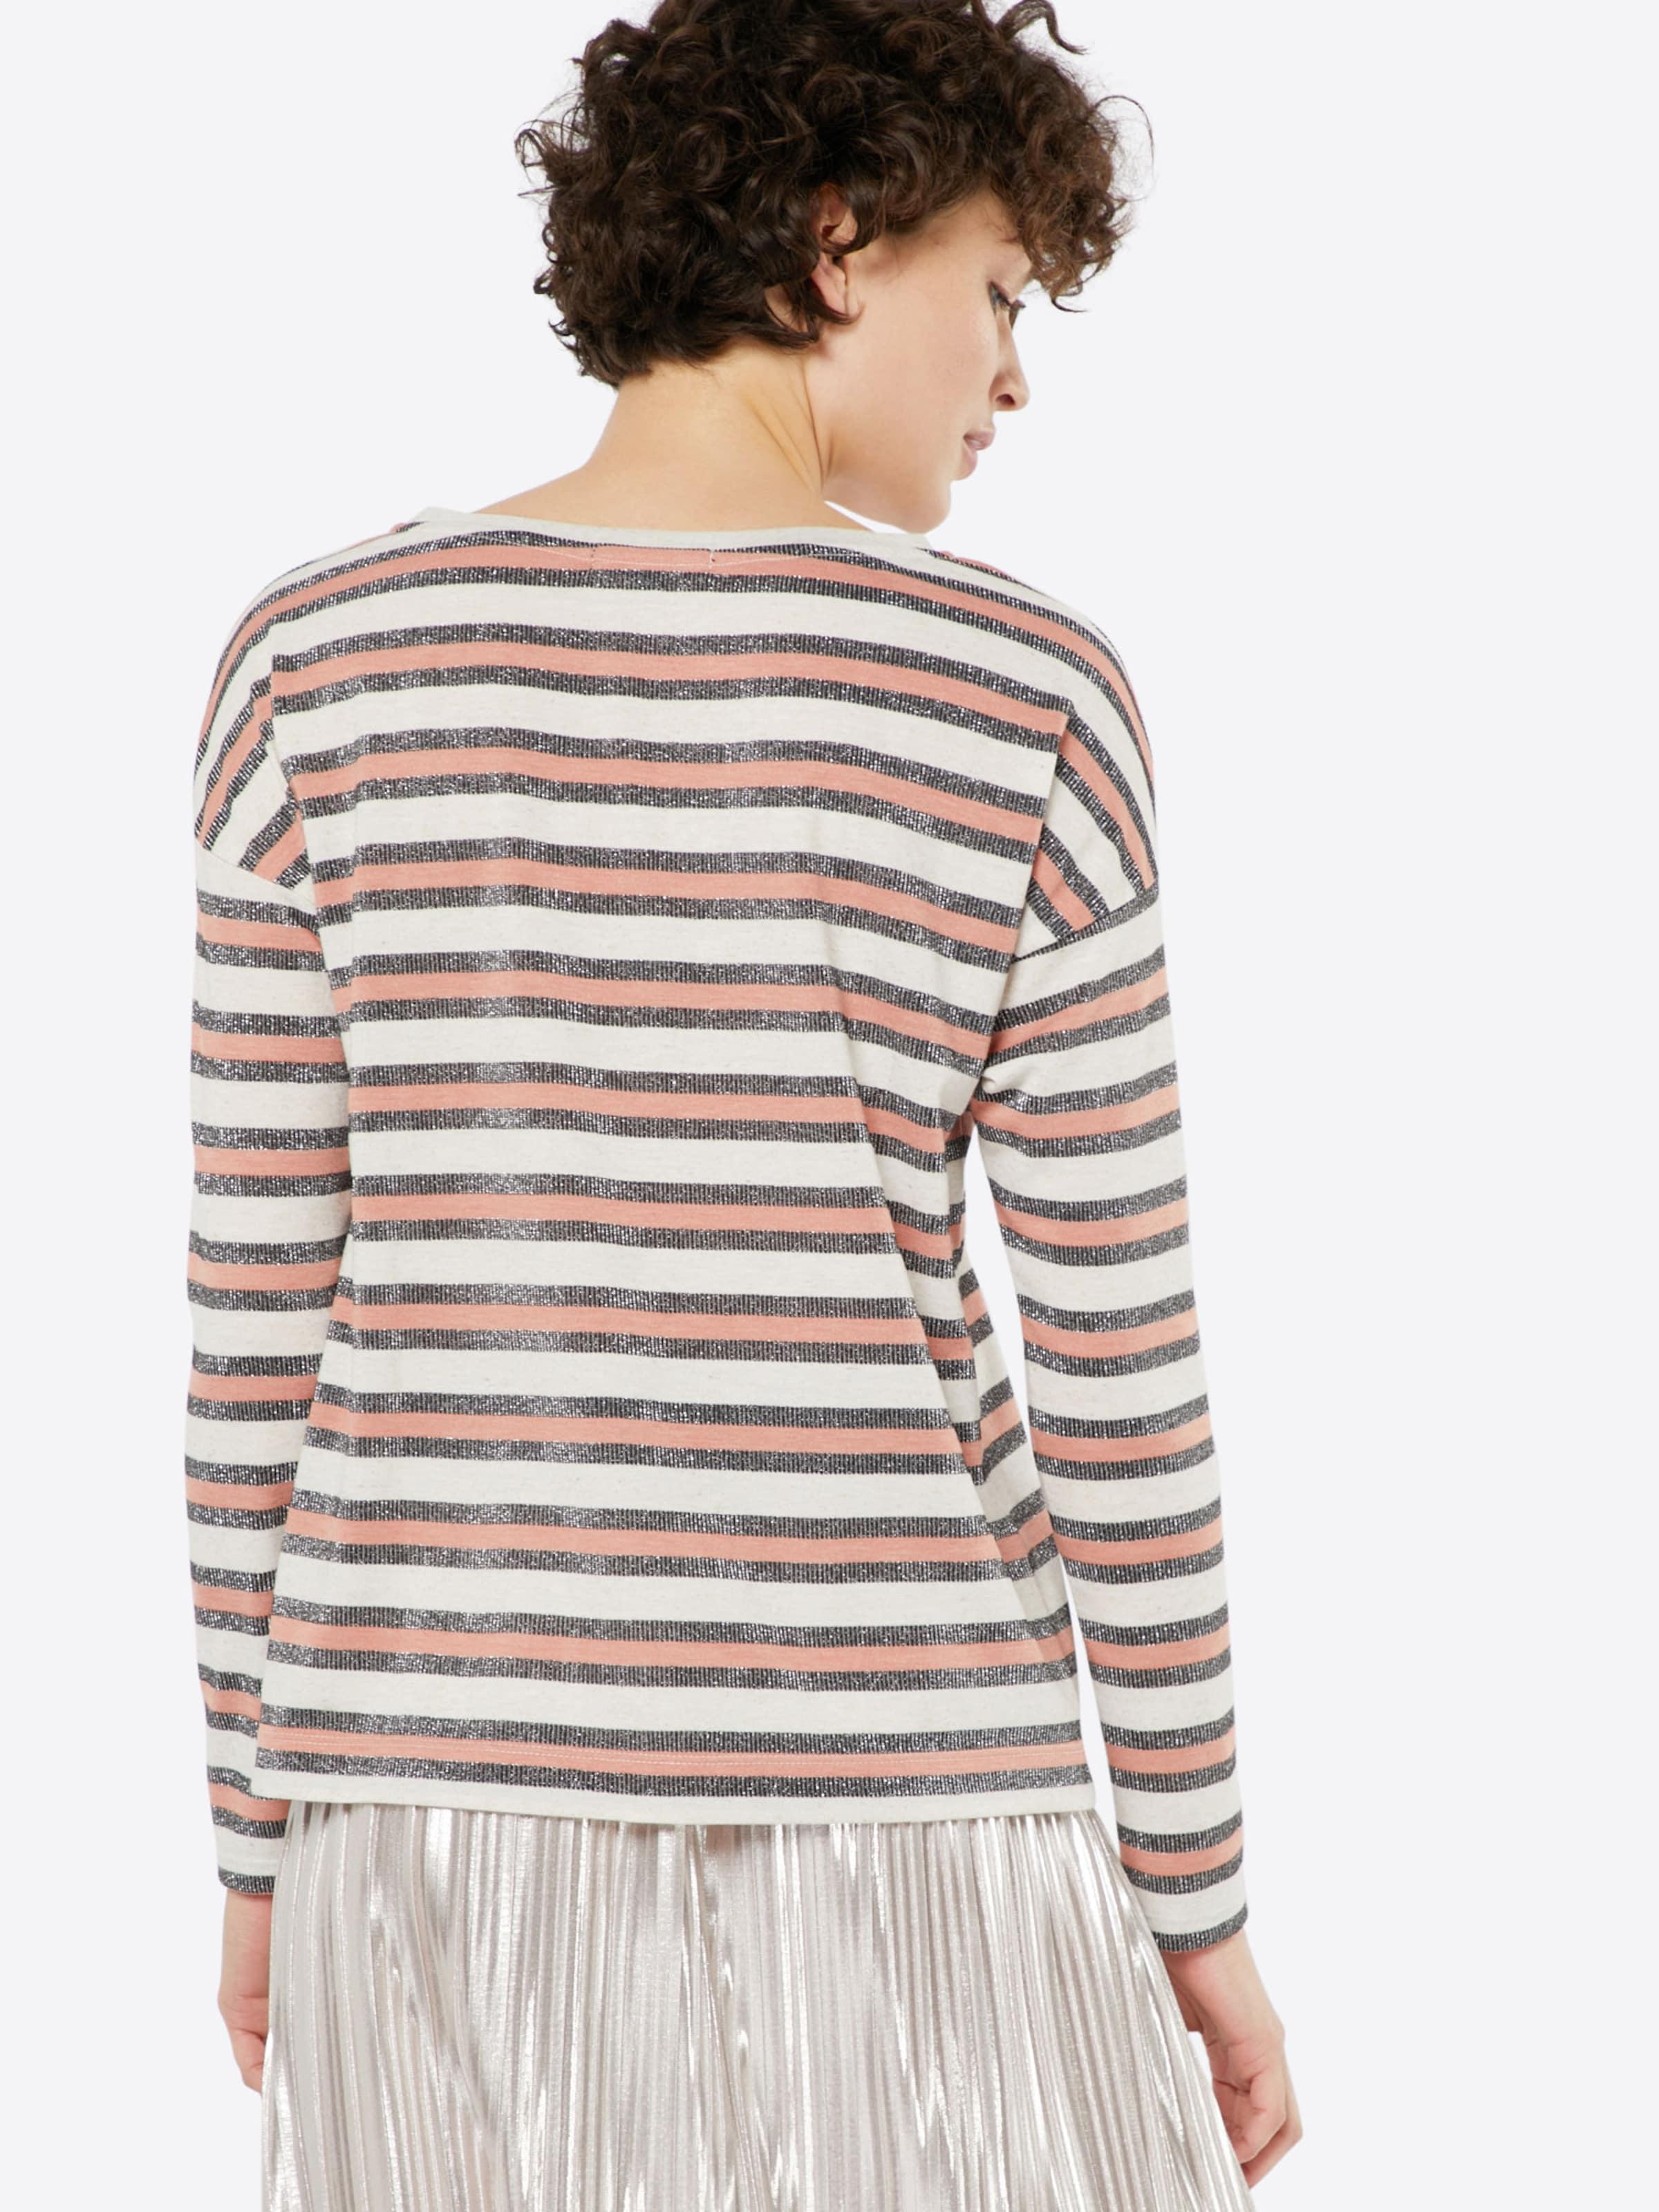 Verkauf Gut Verkaufen Rabatt-Countdown-Paket Pepe Jeans Shirt 'MADERA' jTHsea25Z